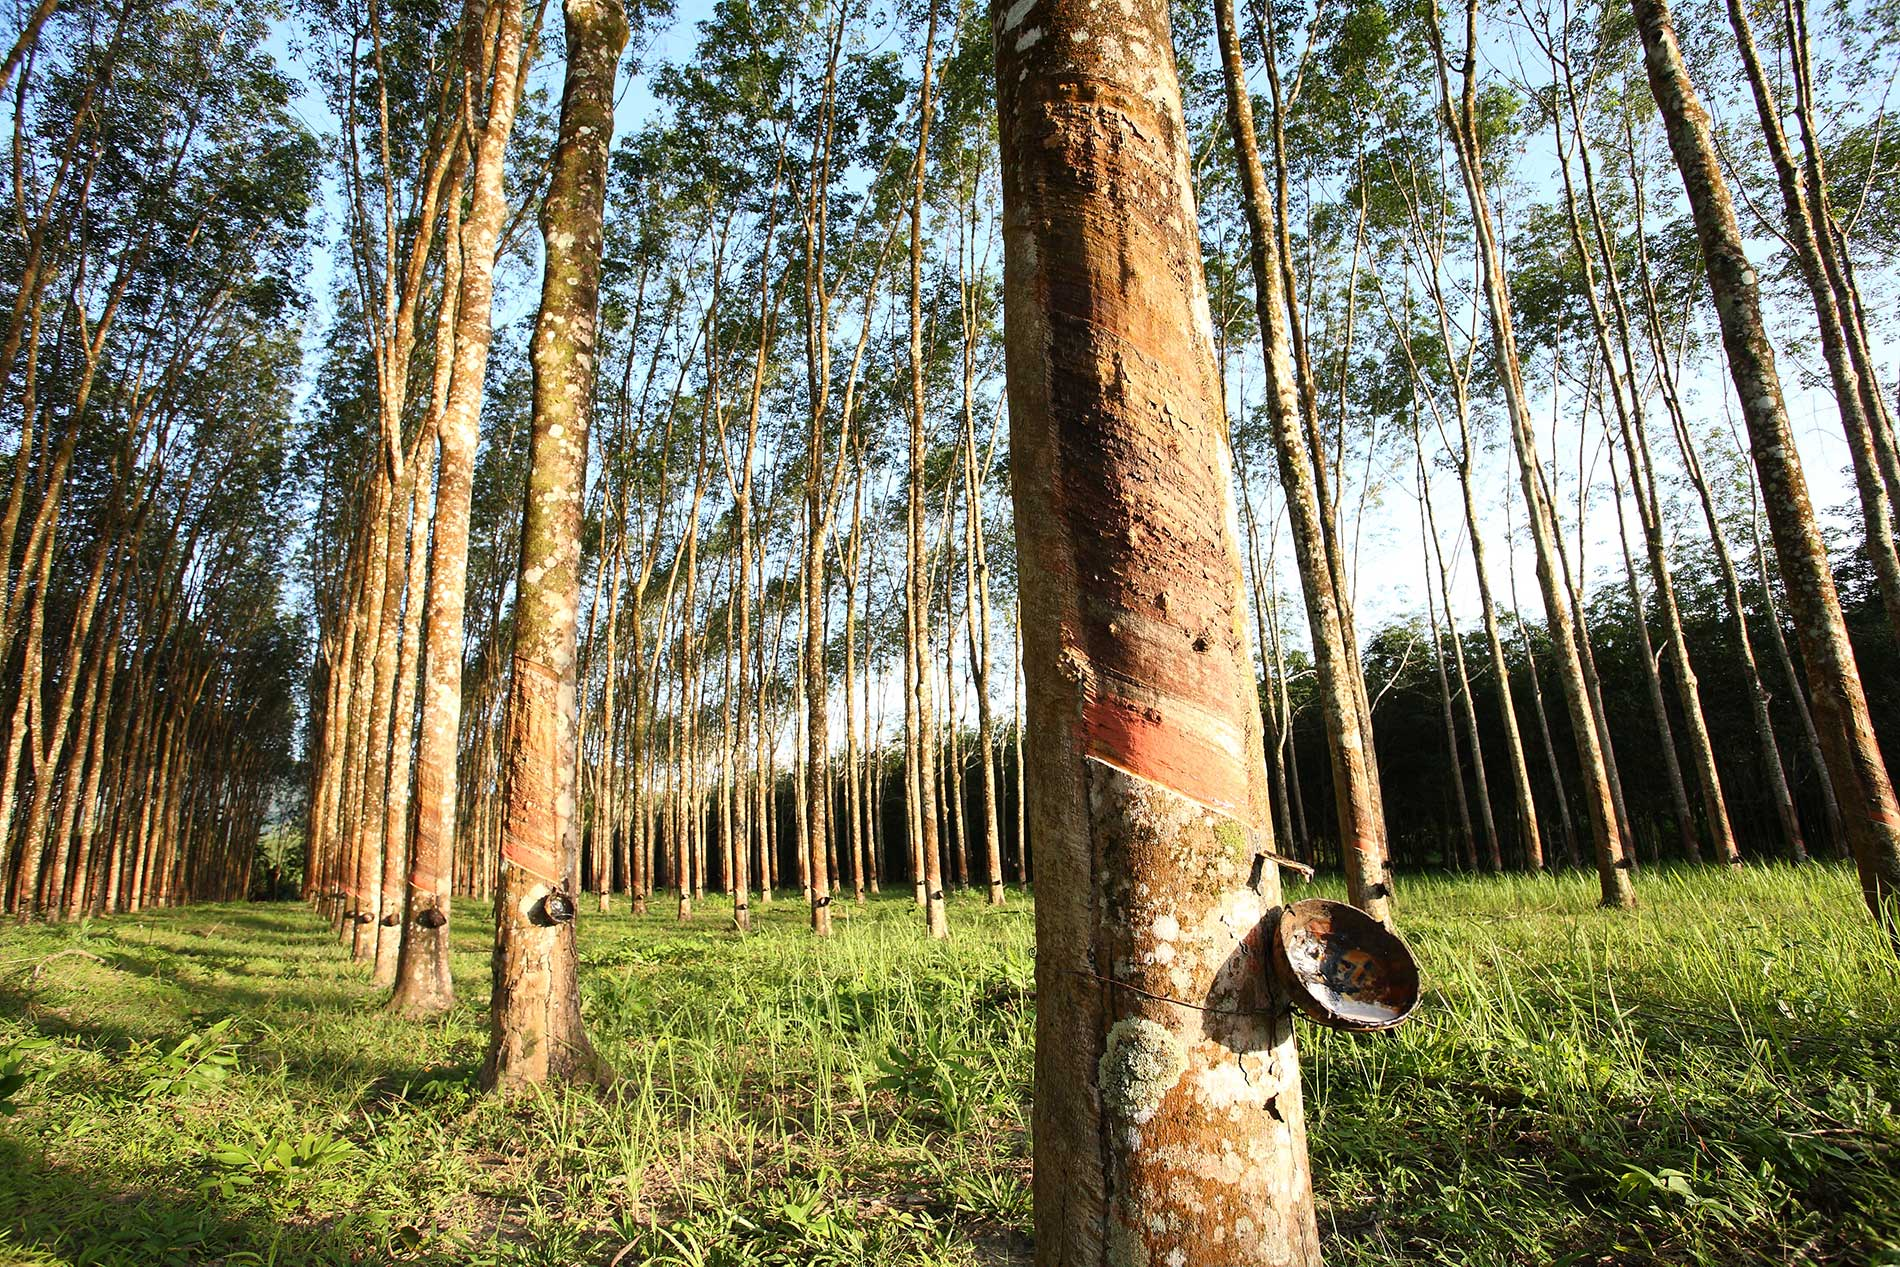 sri-lankan-rubber-trees-1.9k